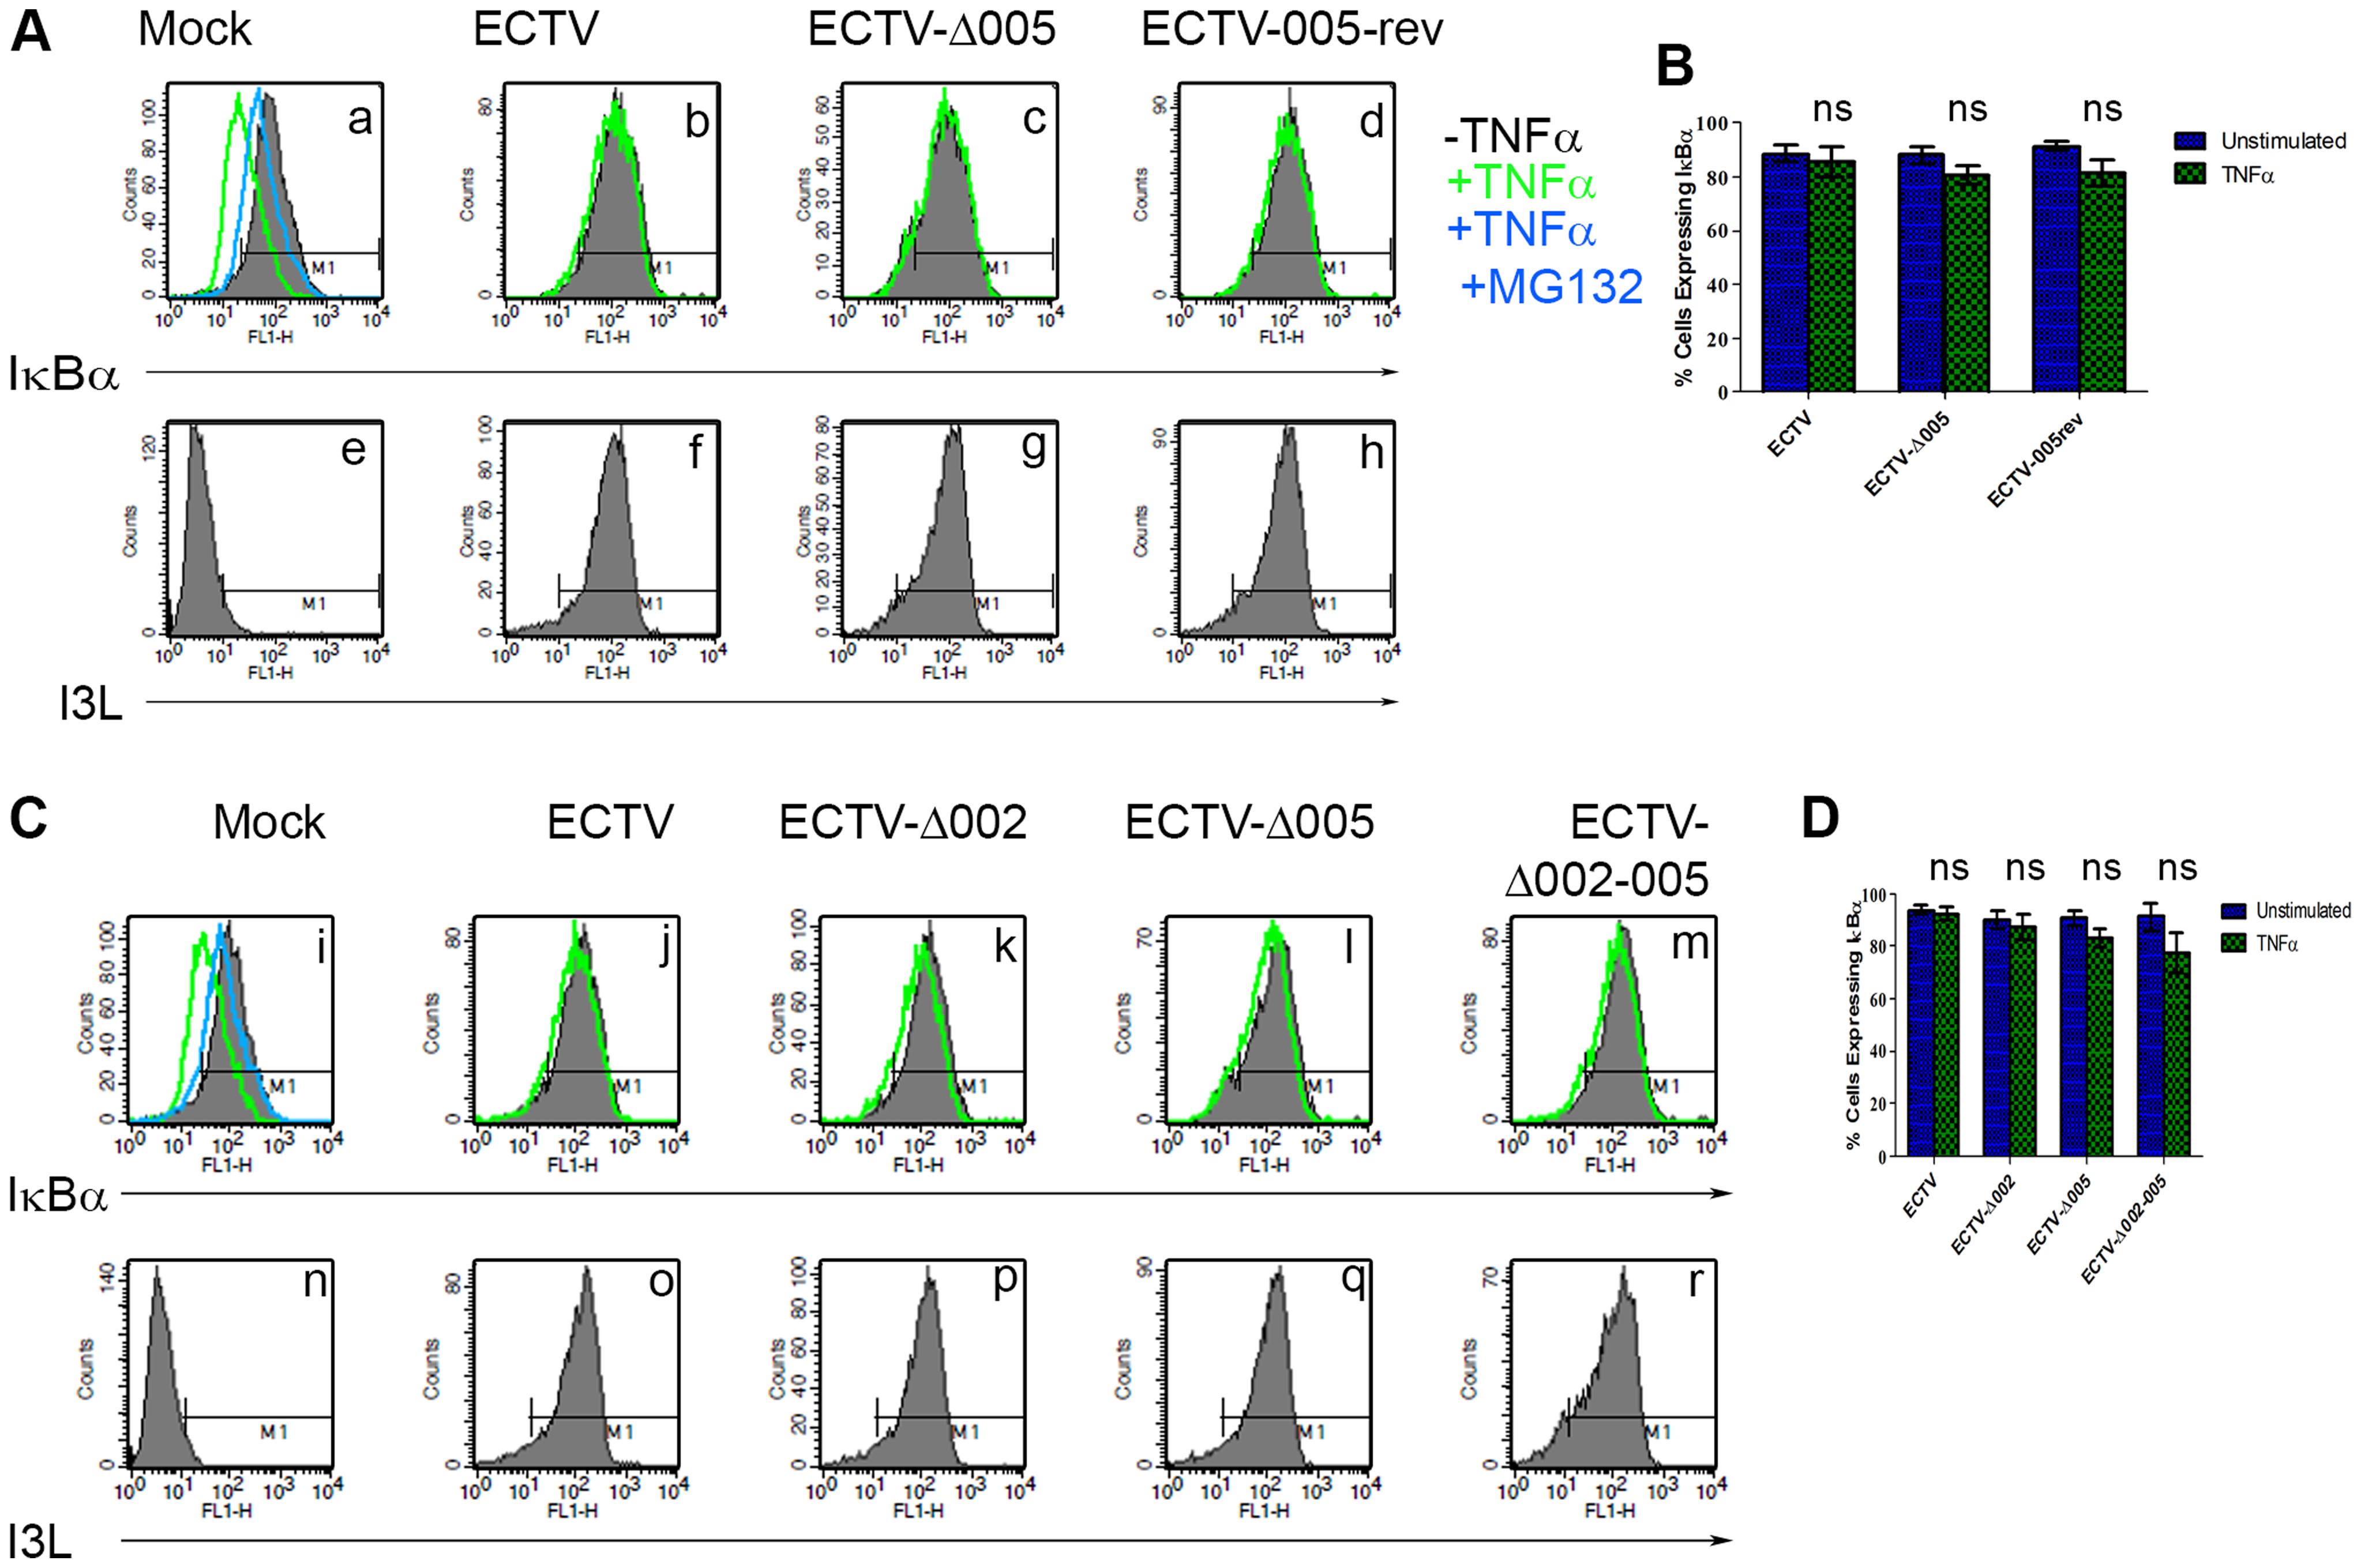 ECTV-Δ005, ECTV-Δ002 and ECTV-Δ002-005 inhibit TNFα induced IκBα degradation.